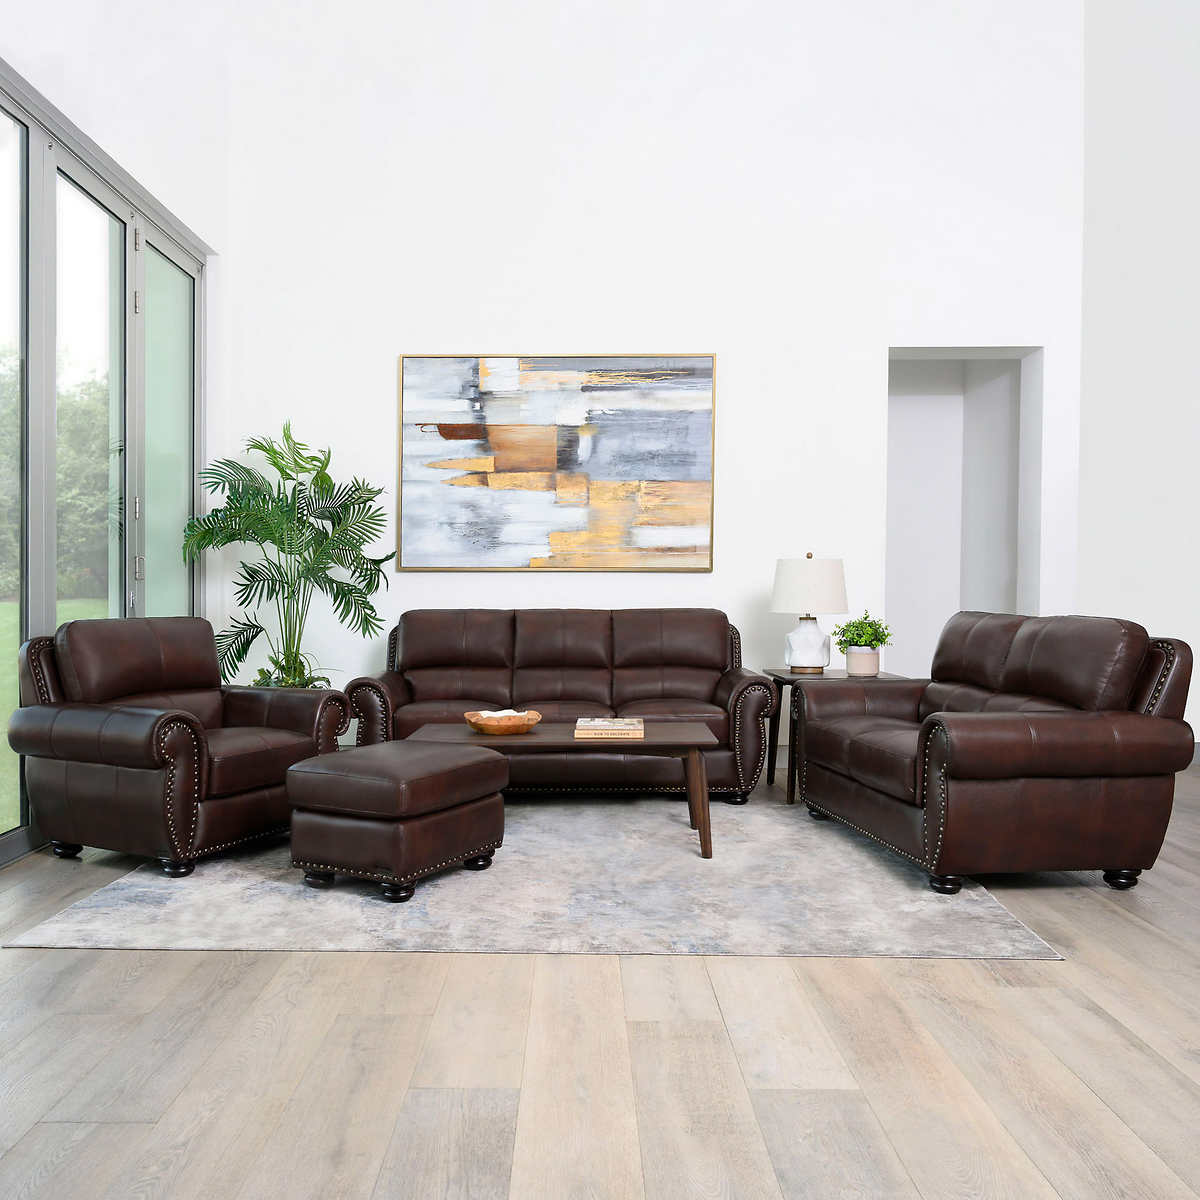 Austin 10-piece Top Grain Leather Living Room Set